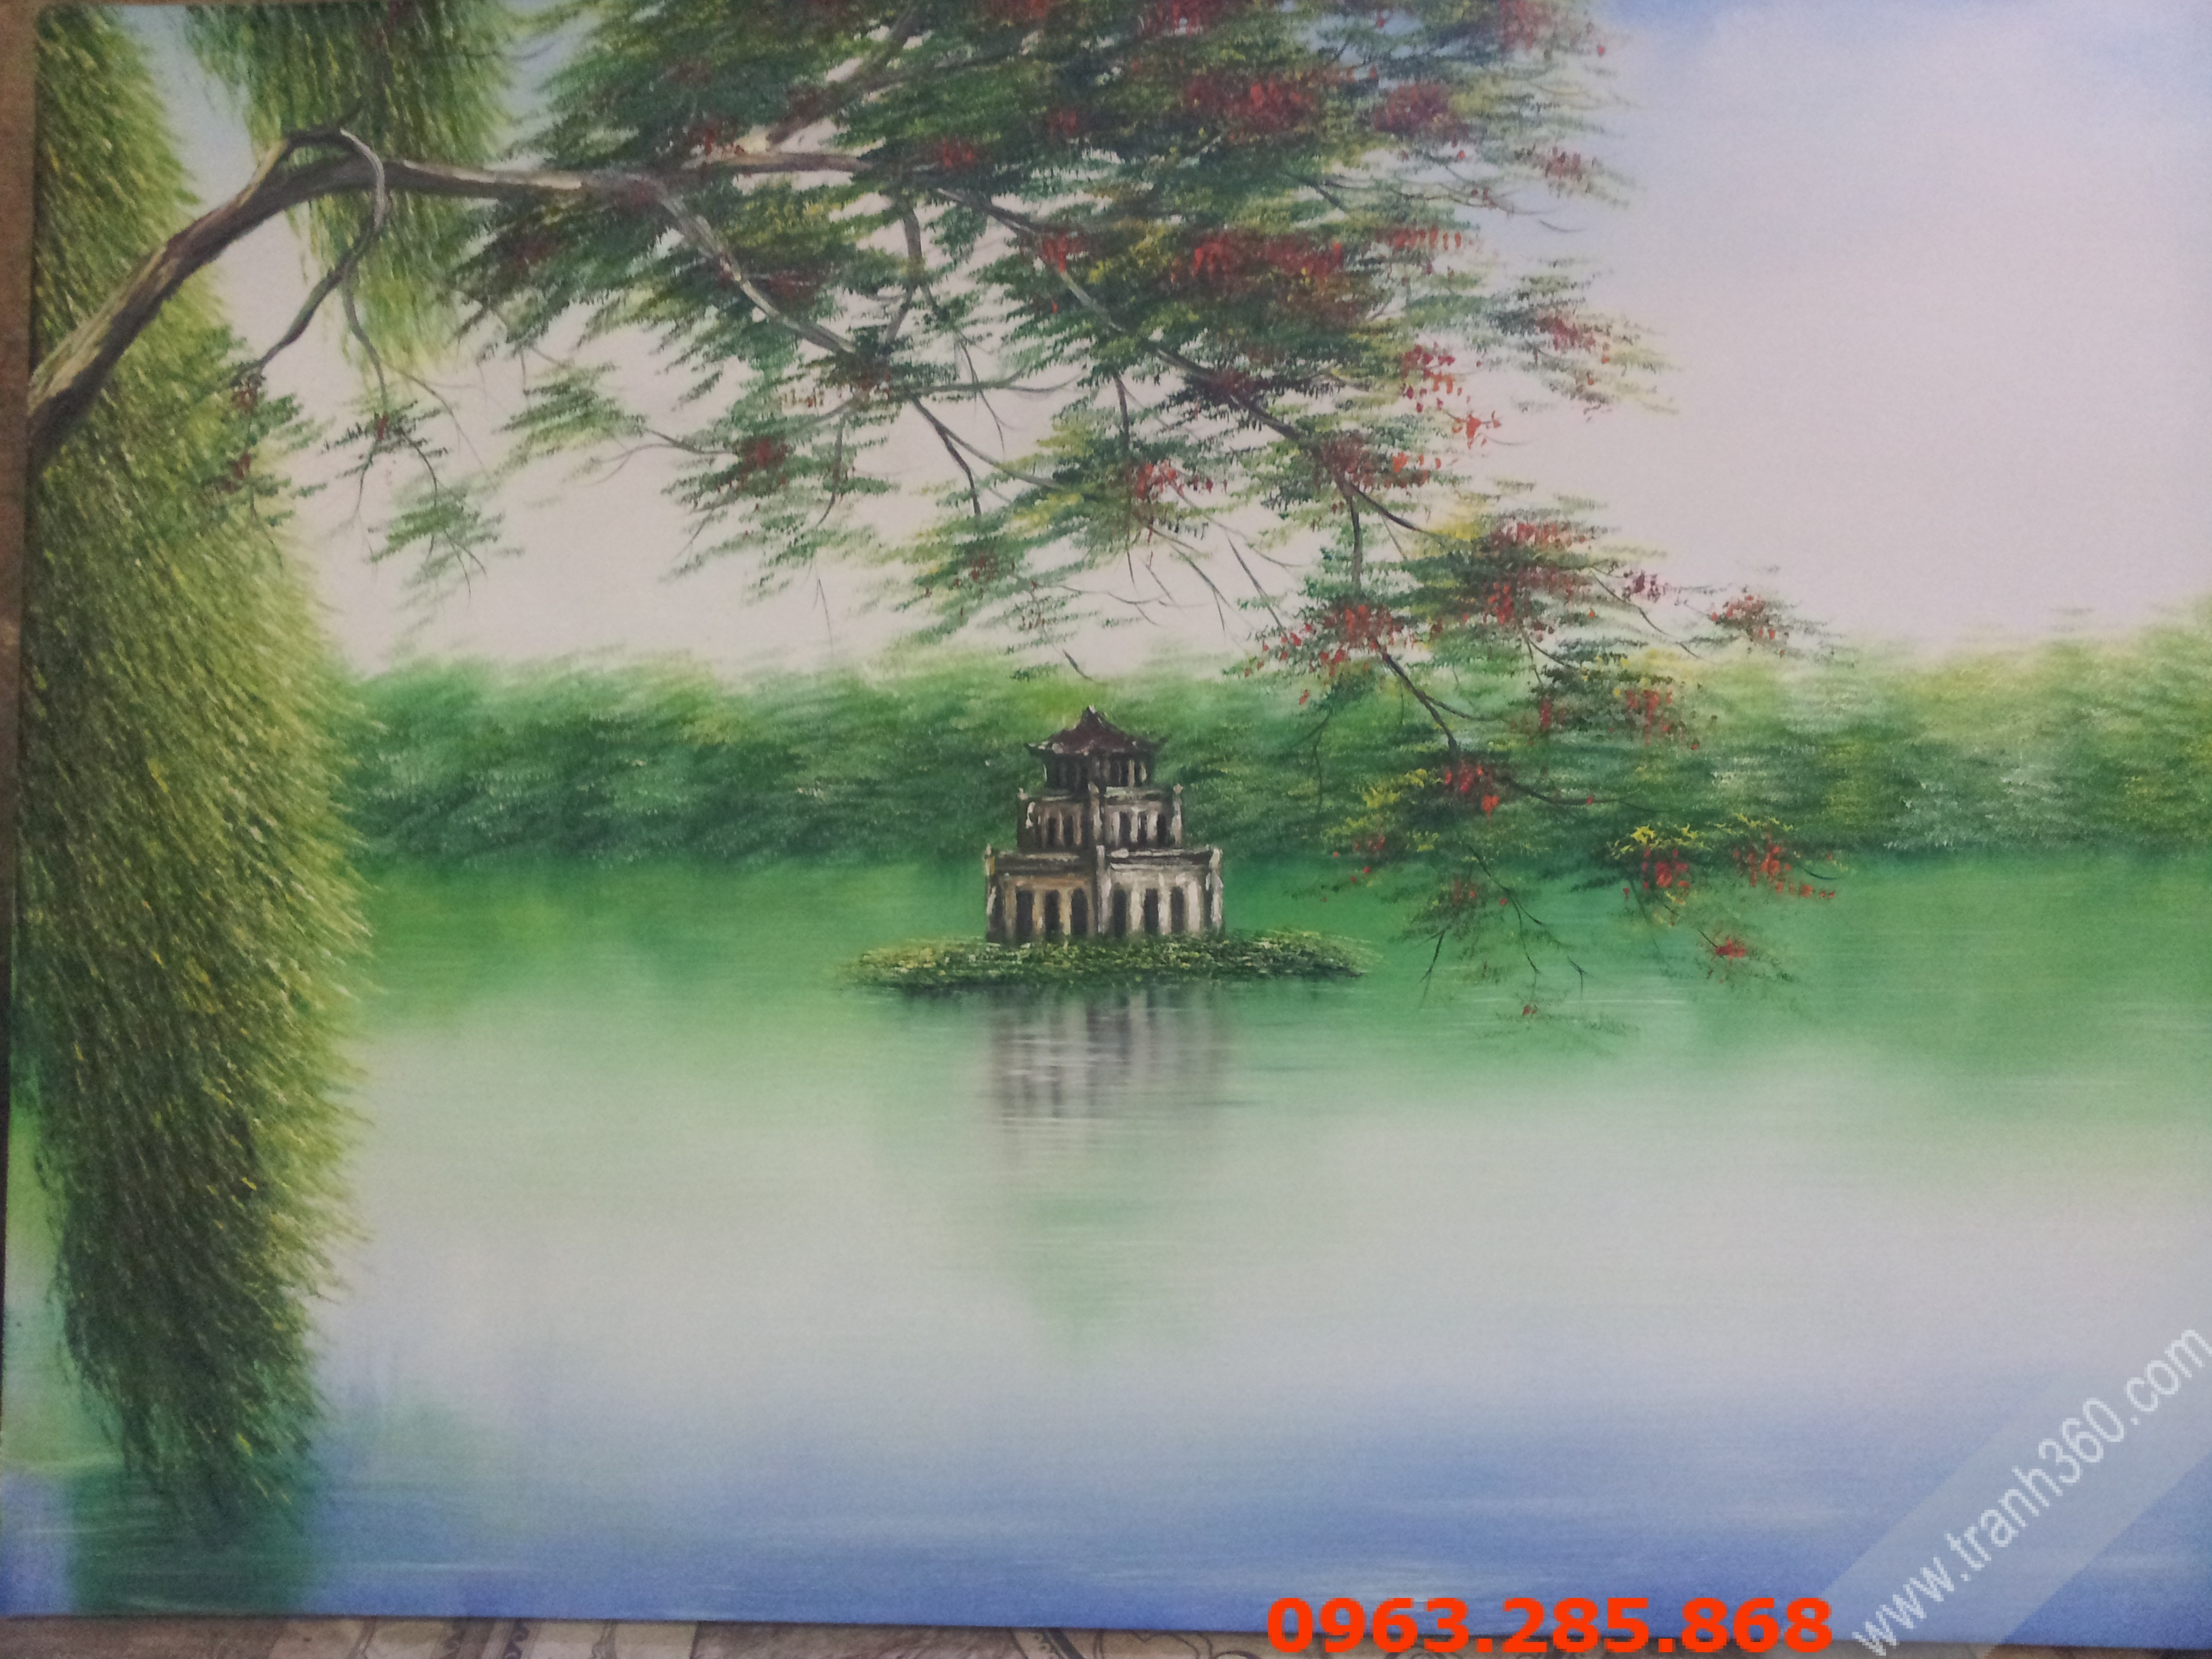 Tranh phong cảnh Ho guom